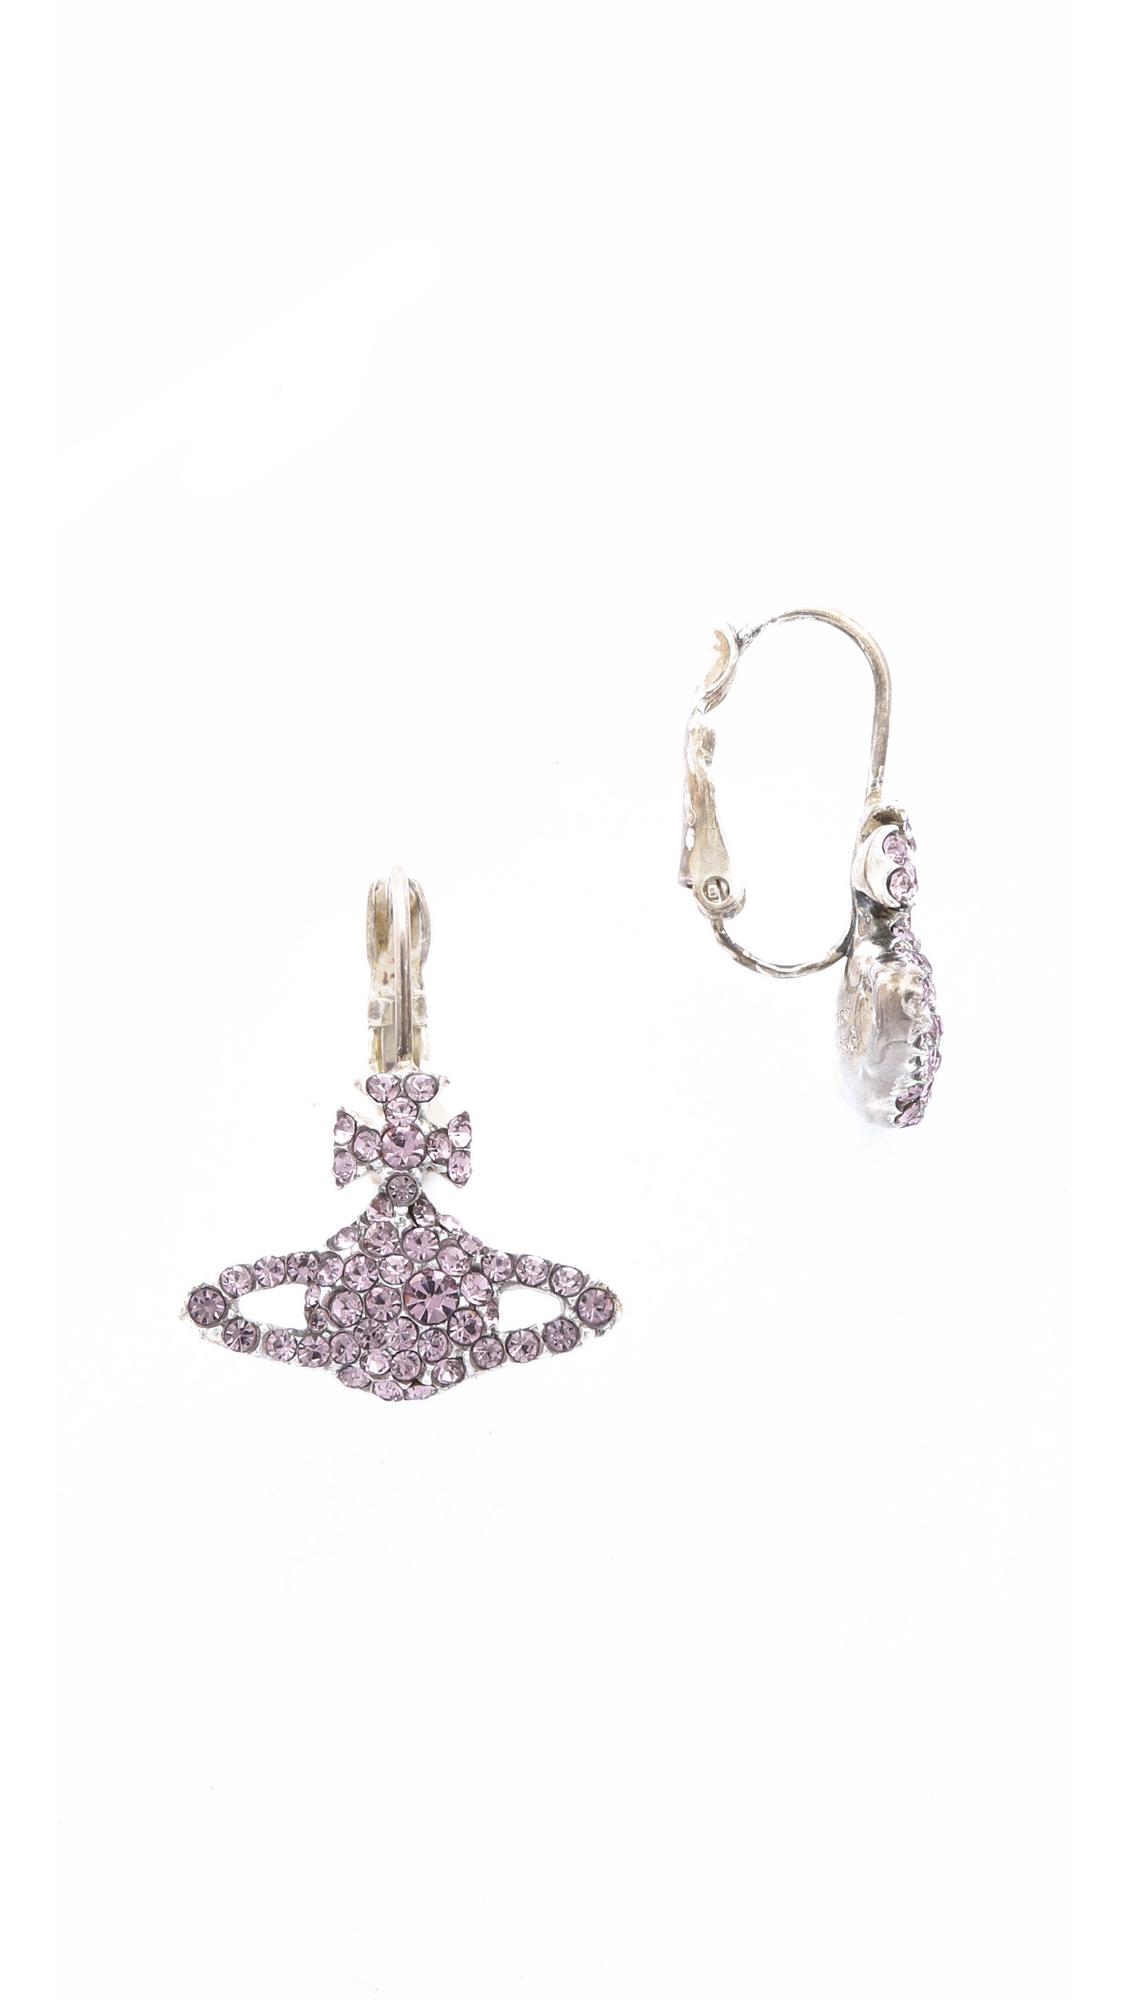 b392fa9bc Vivienne Westwood Grace Bas Relief Earrings - Light Amethyst in ...